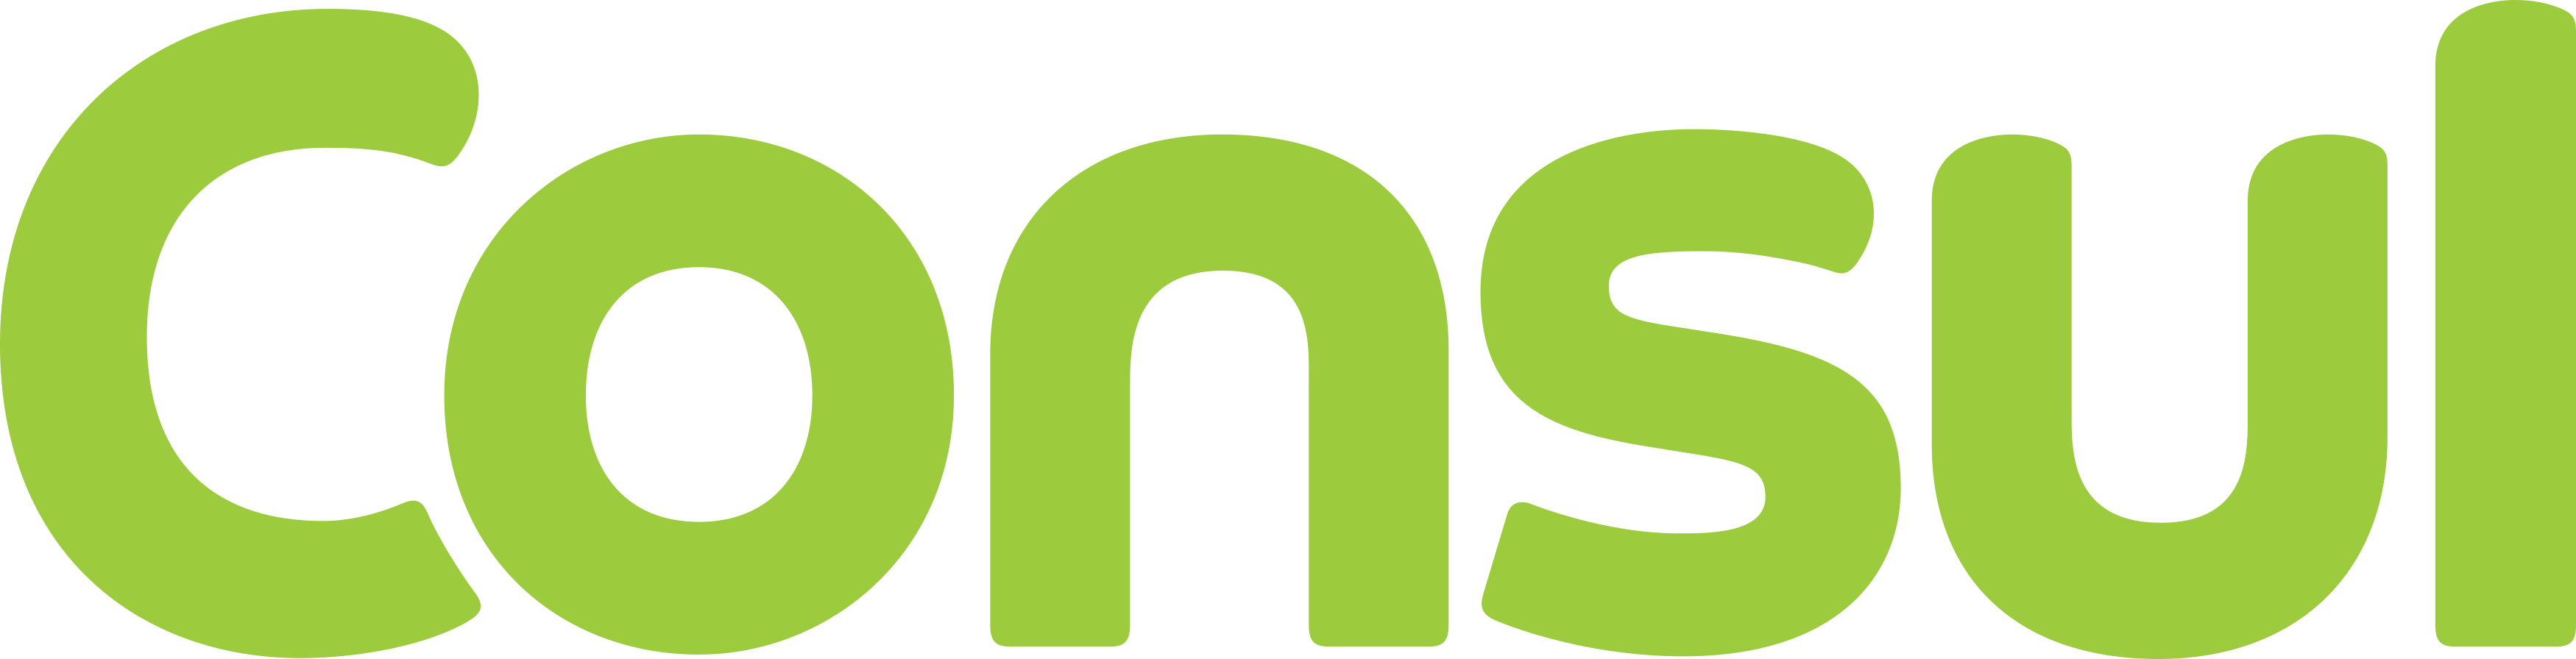 Logo da marca consul